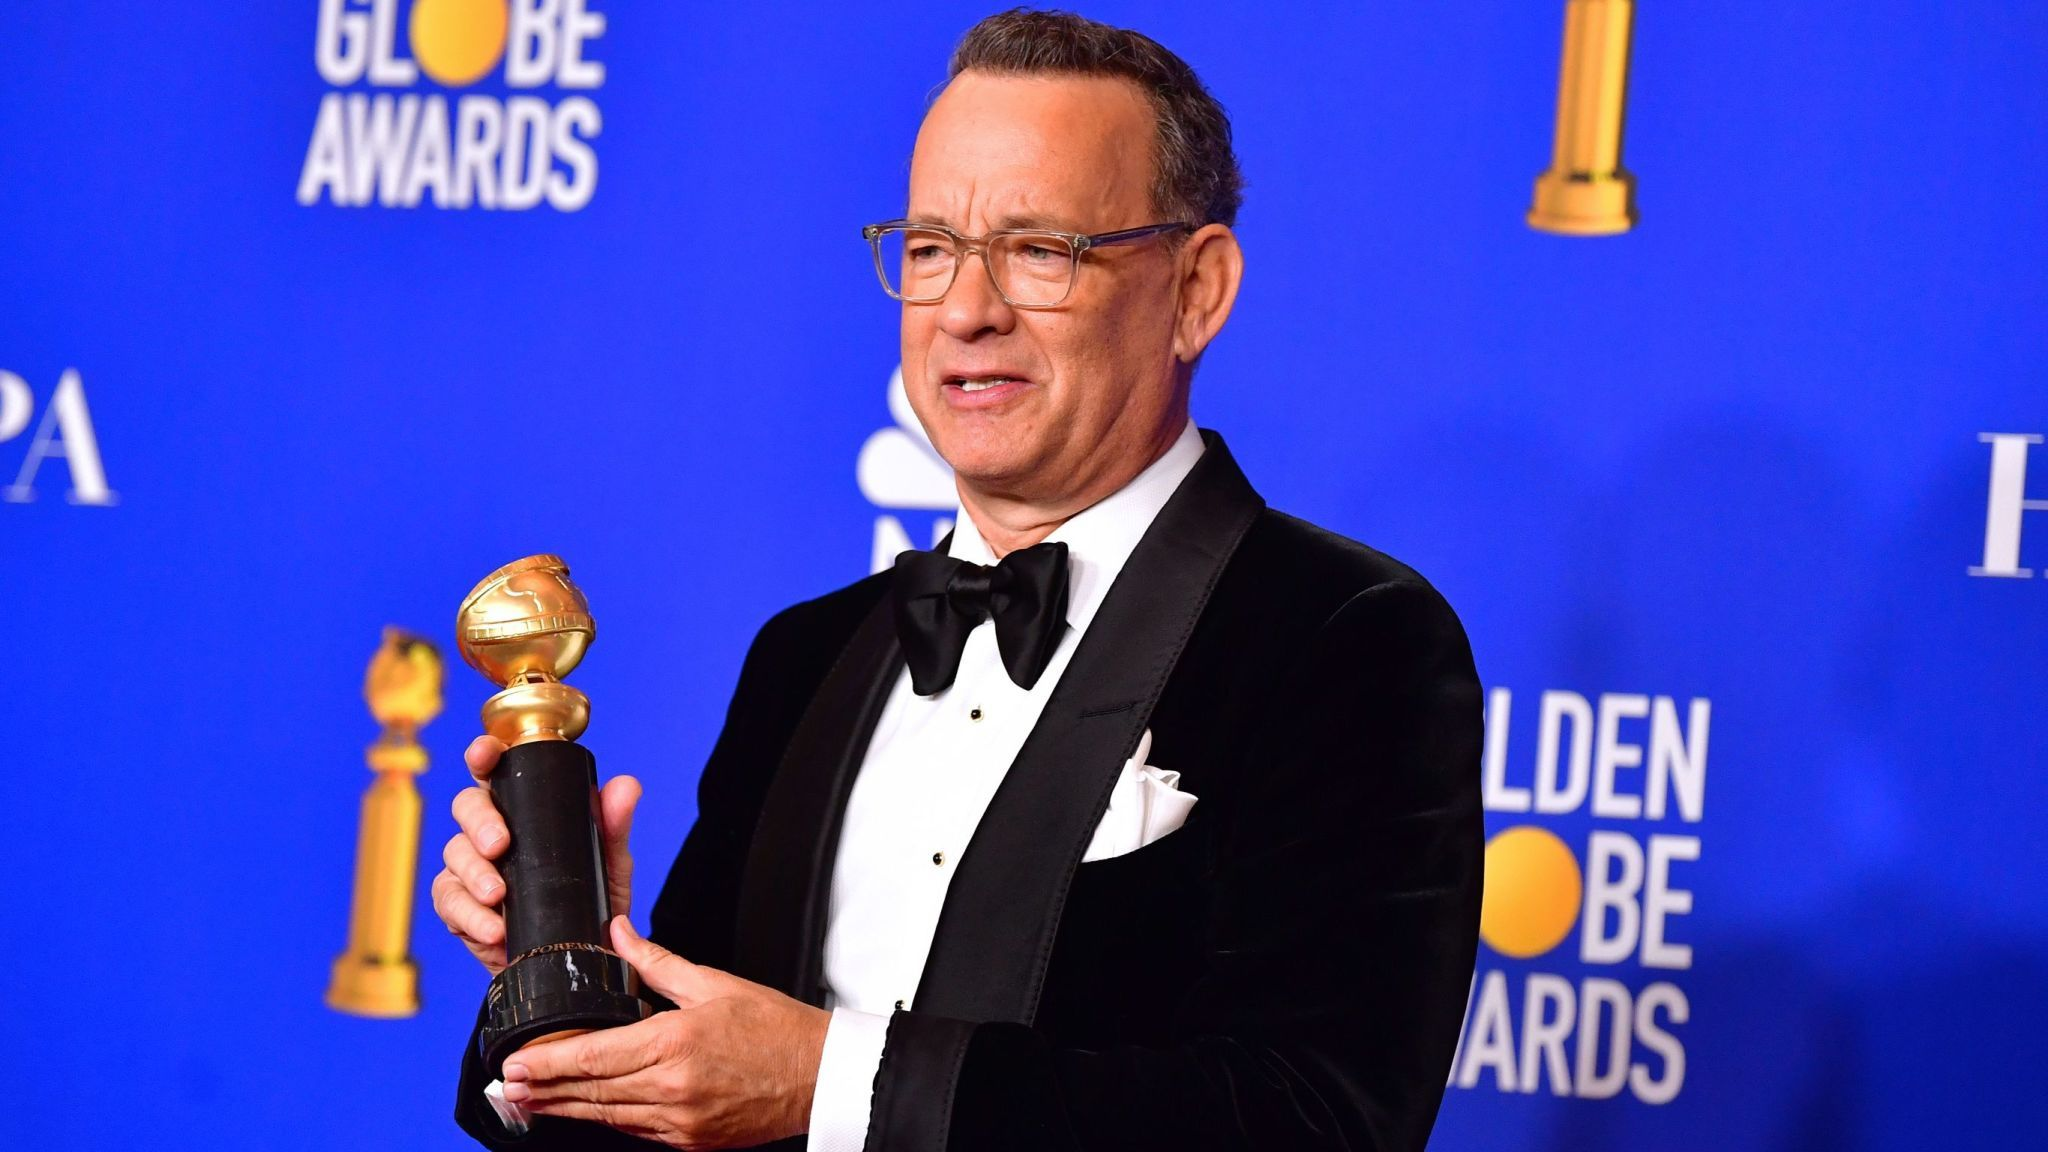 Golden Globes winner Tom Hanks with the Cecil B Demille lifetime achievement award